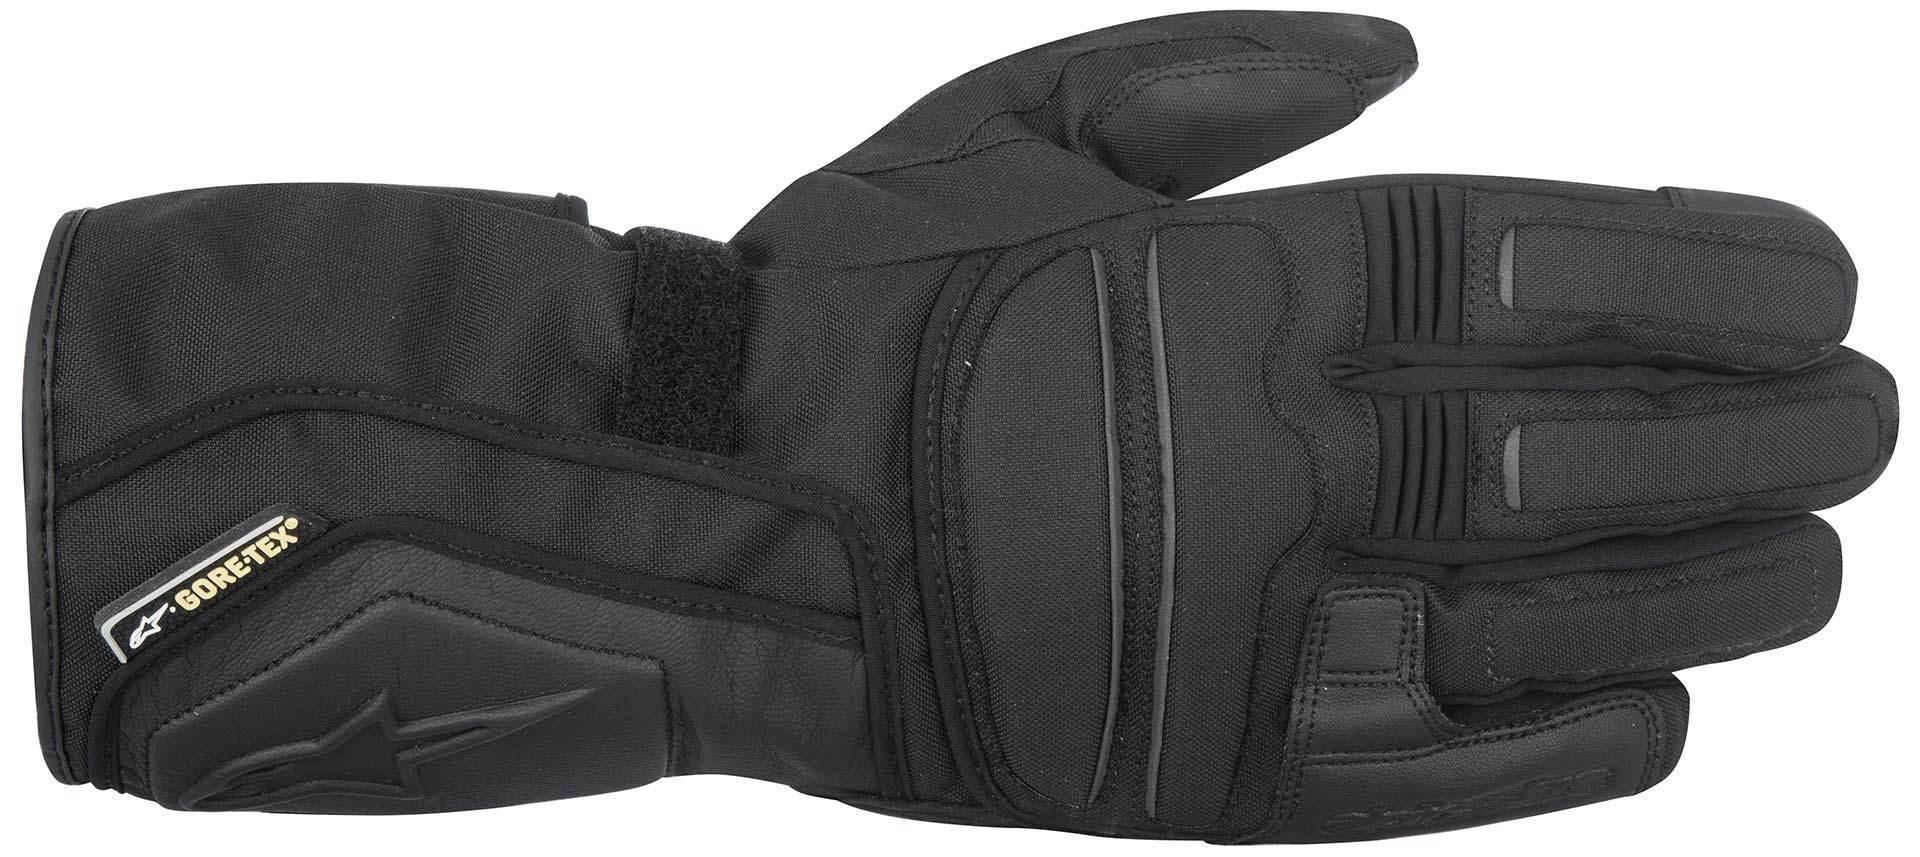 Alpinestars Stella WR-V Gore-Tex Ladies Waterproof Gloves 2016 Black M